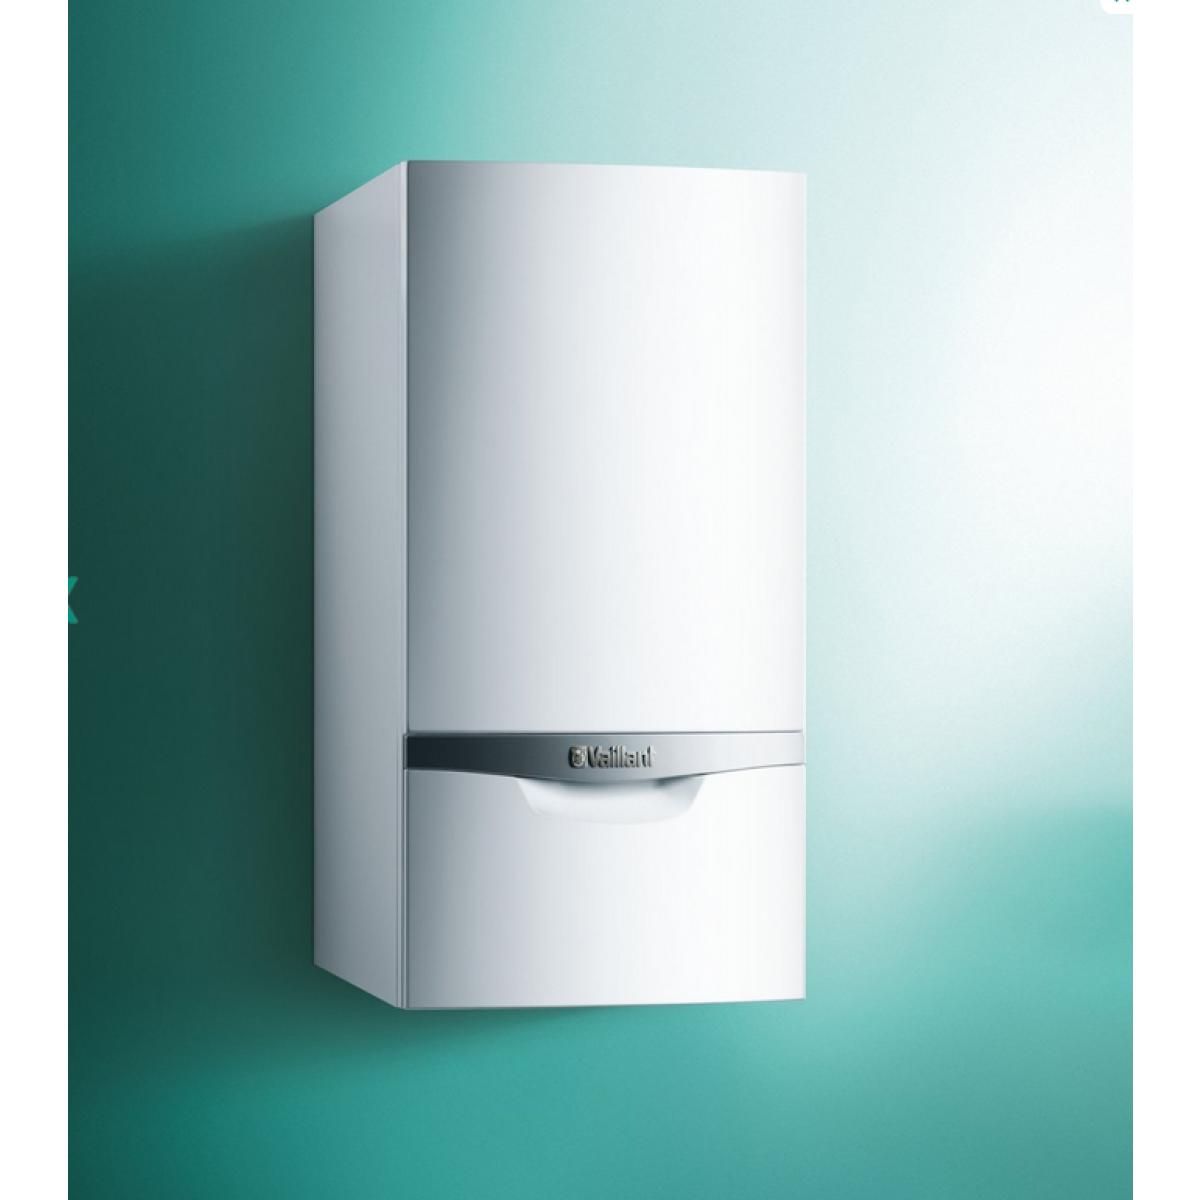 chaudi re gaz condensation ecotec vaillant. Black Bedroom Furniture Sets. Home Design Ideas